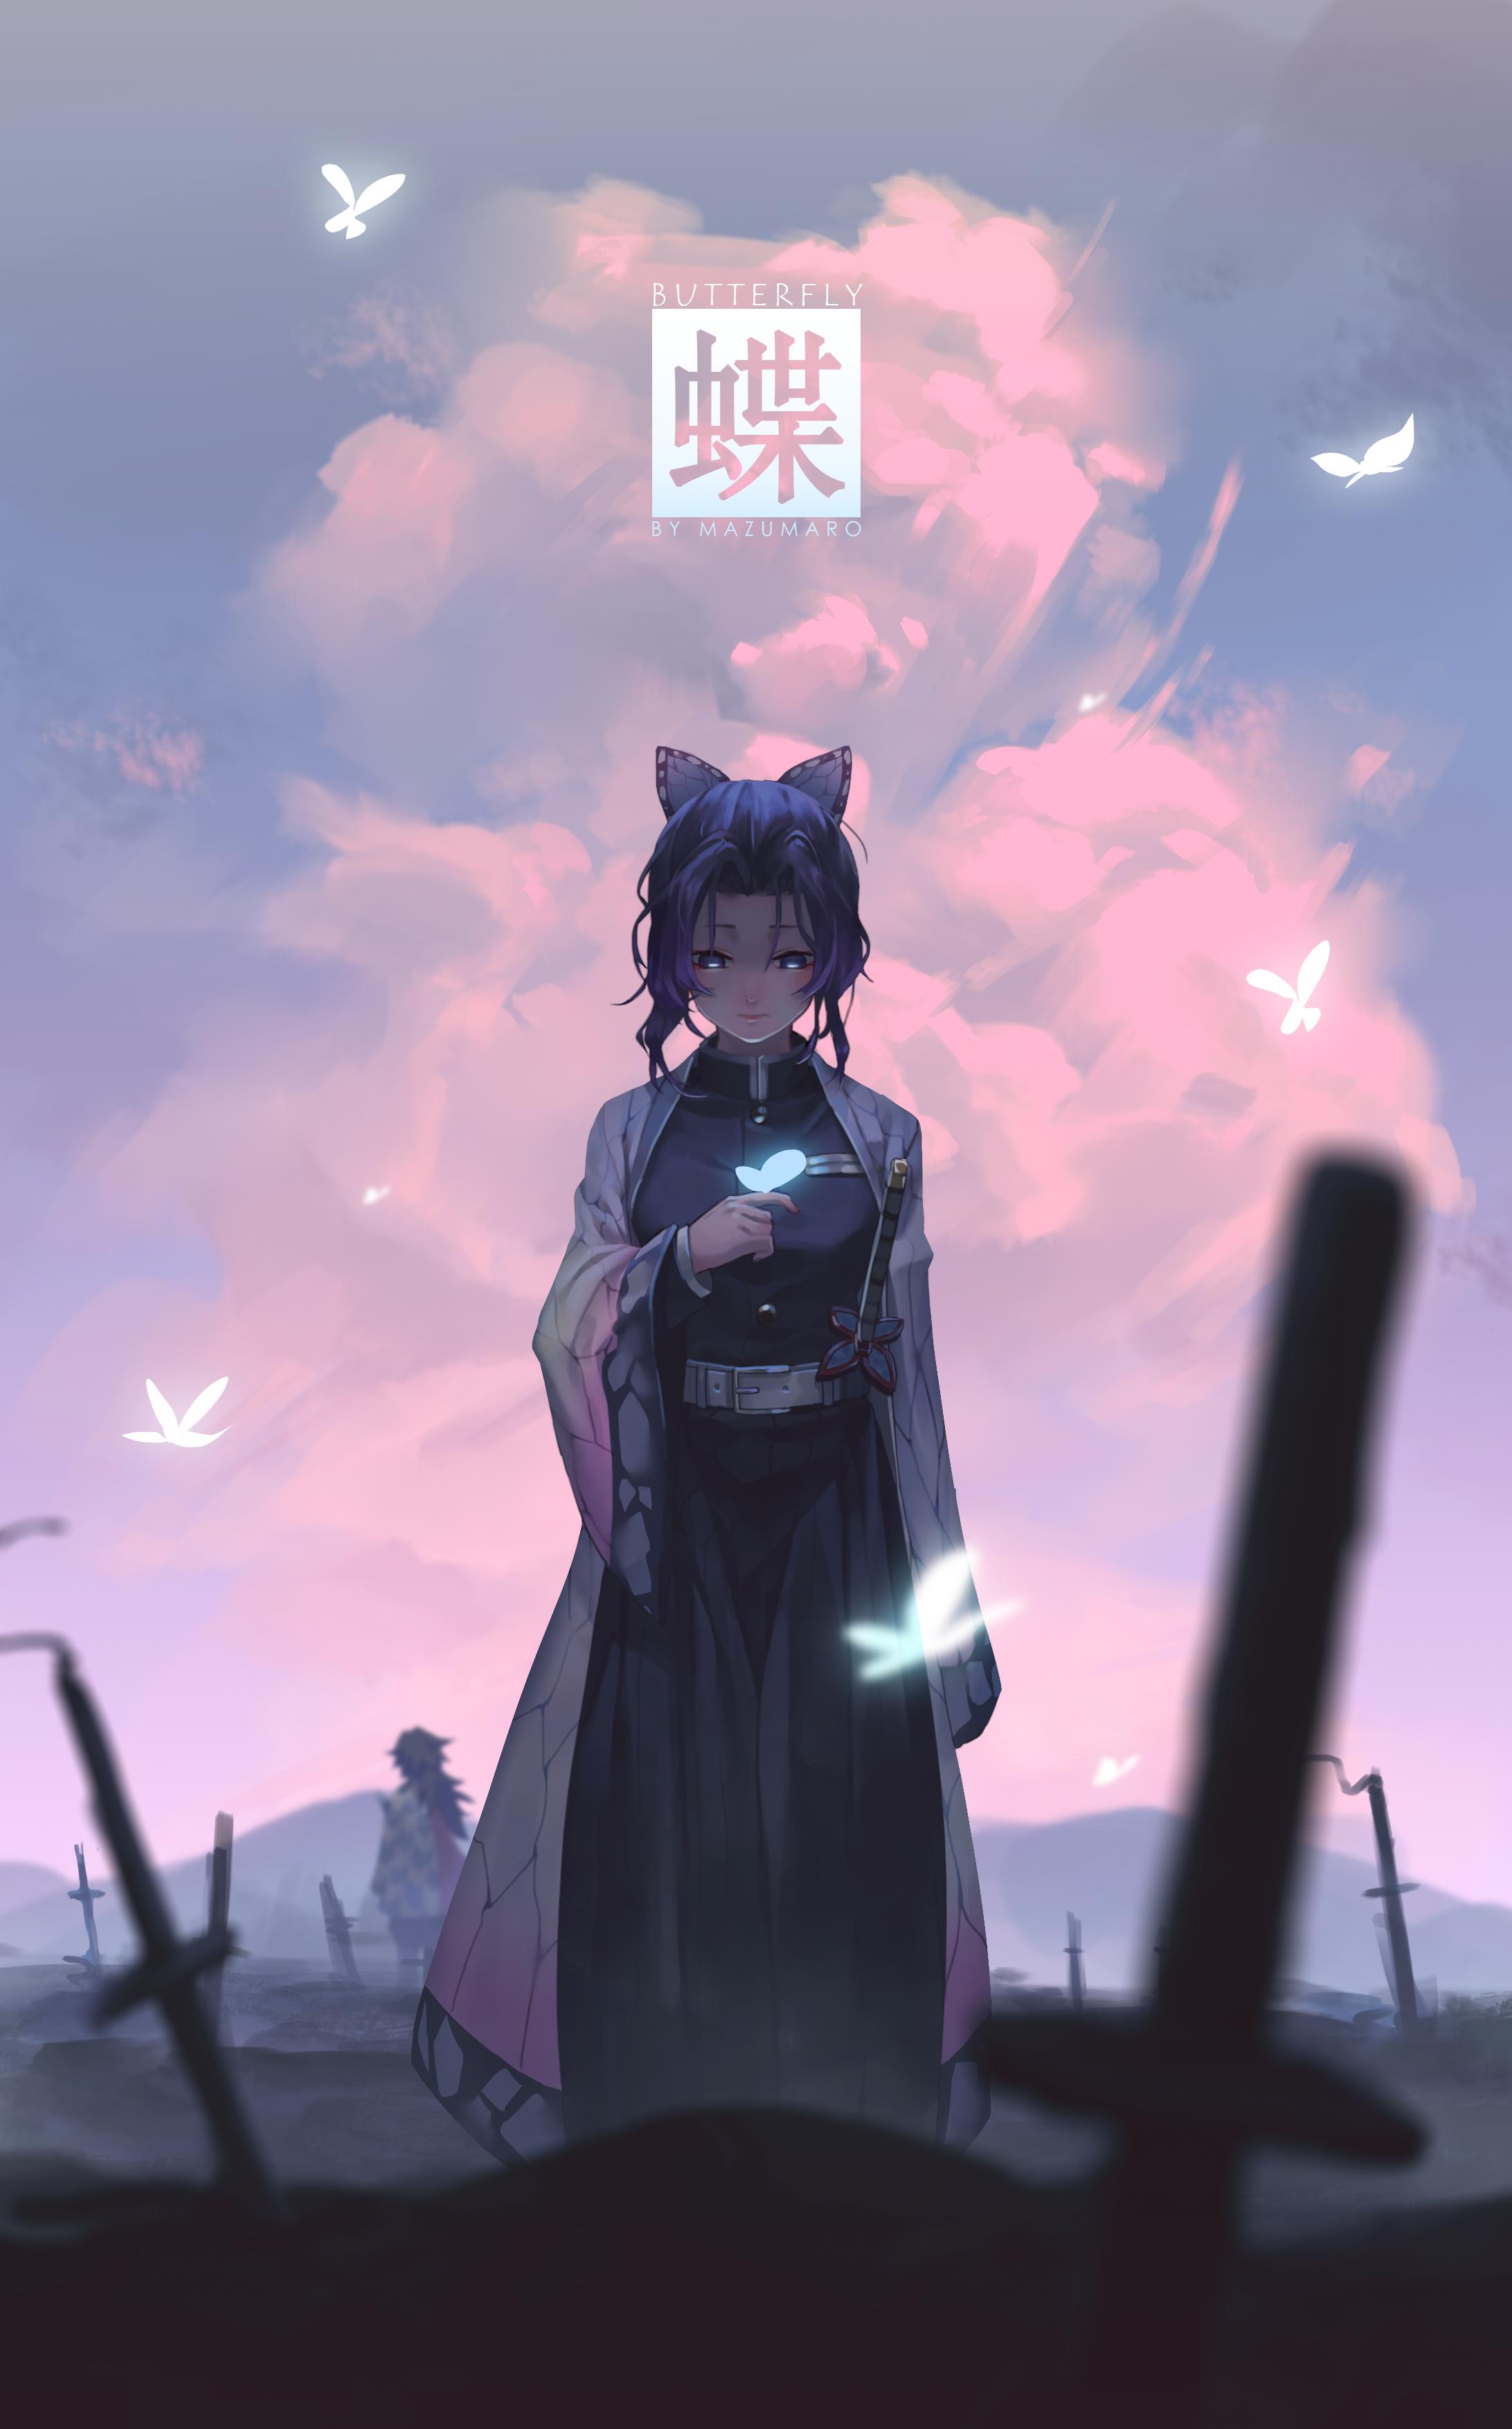 Anime 2184x3508 Kimetsu no Yaiba digital art frontal view